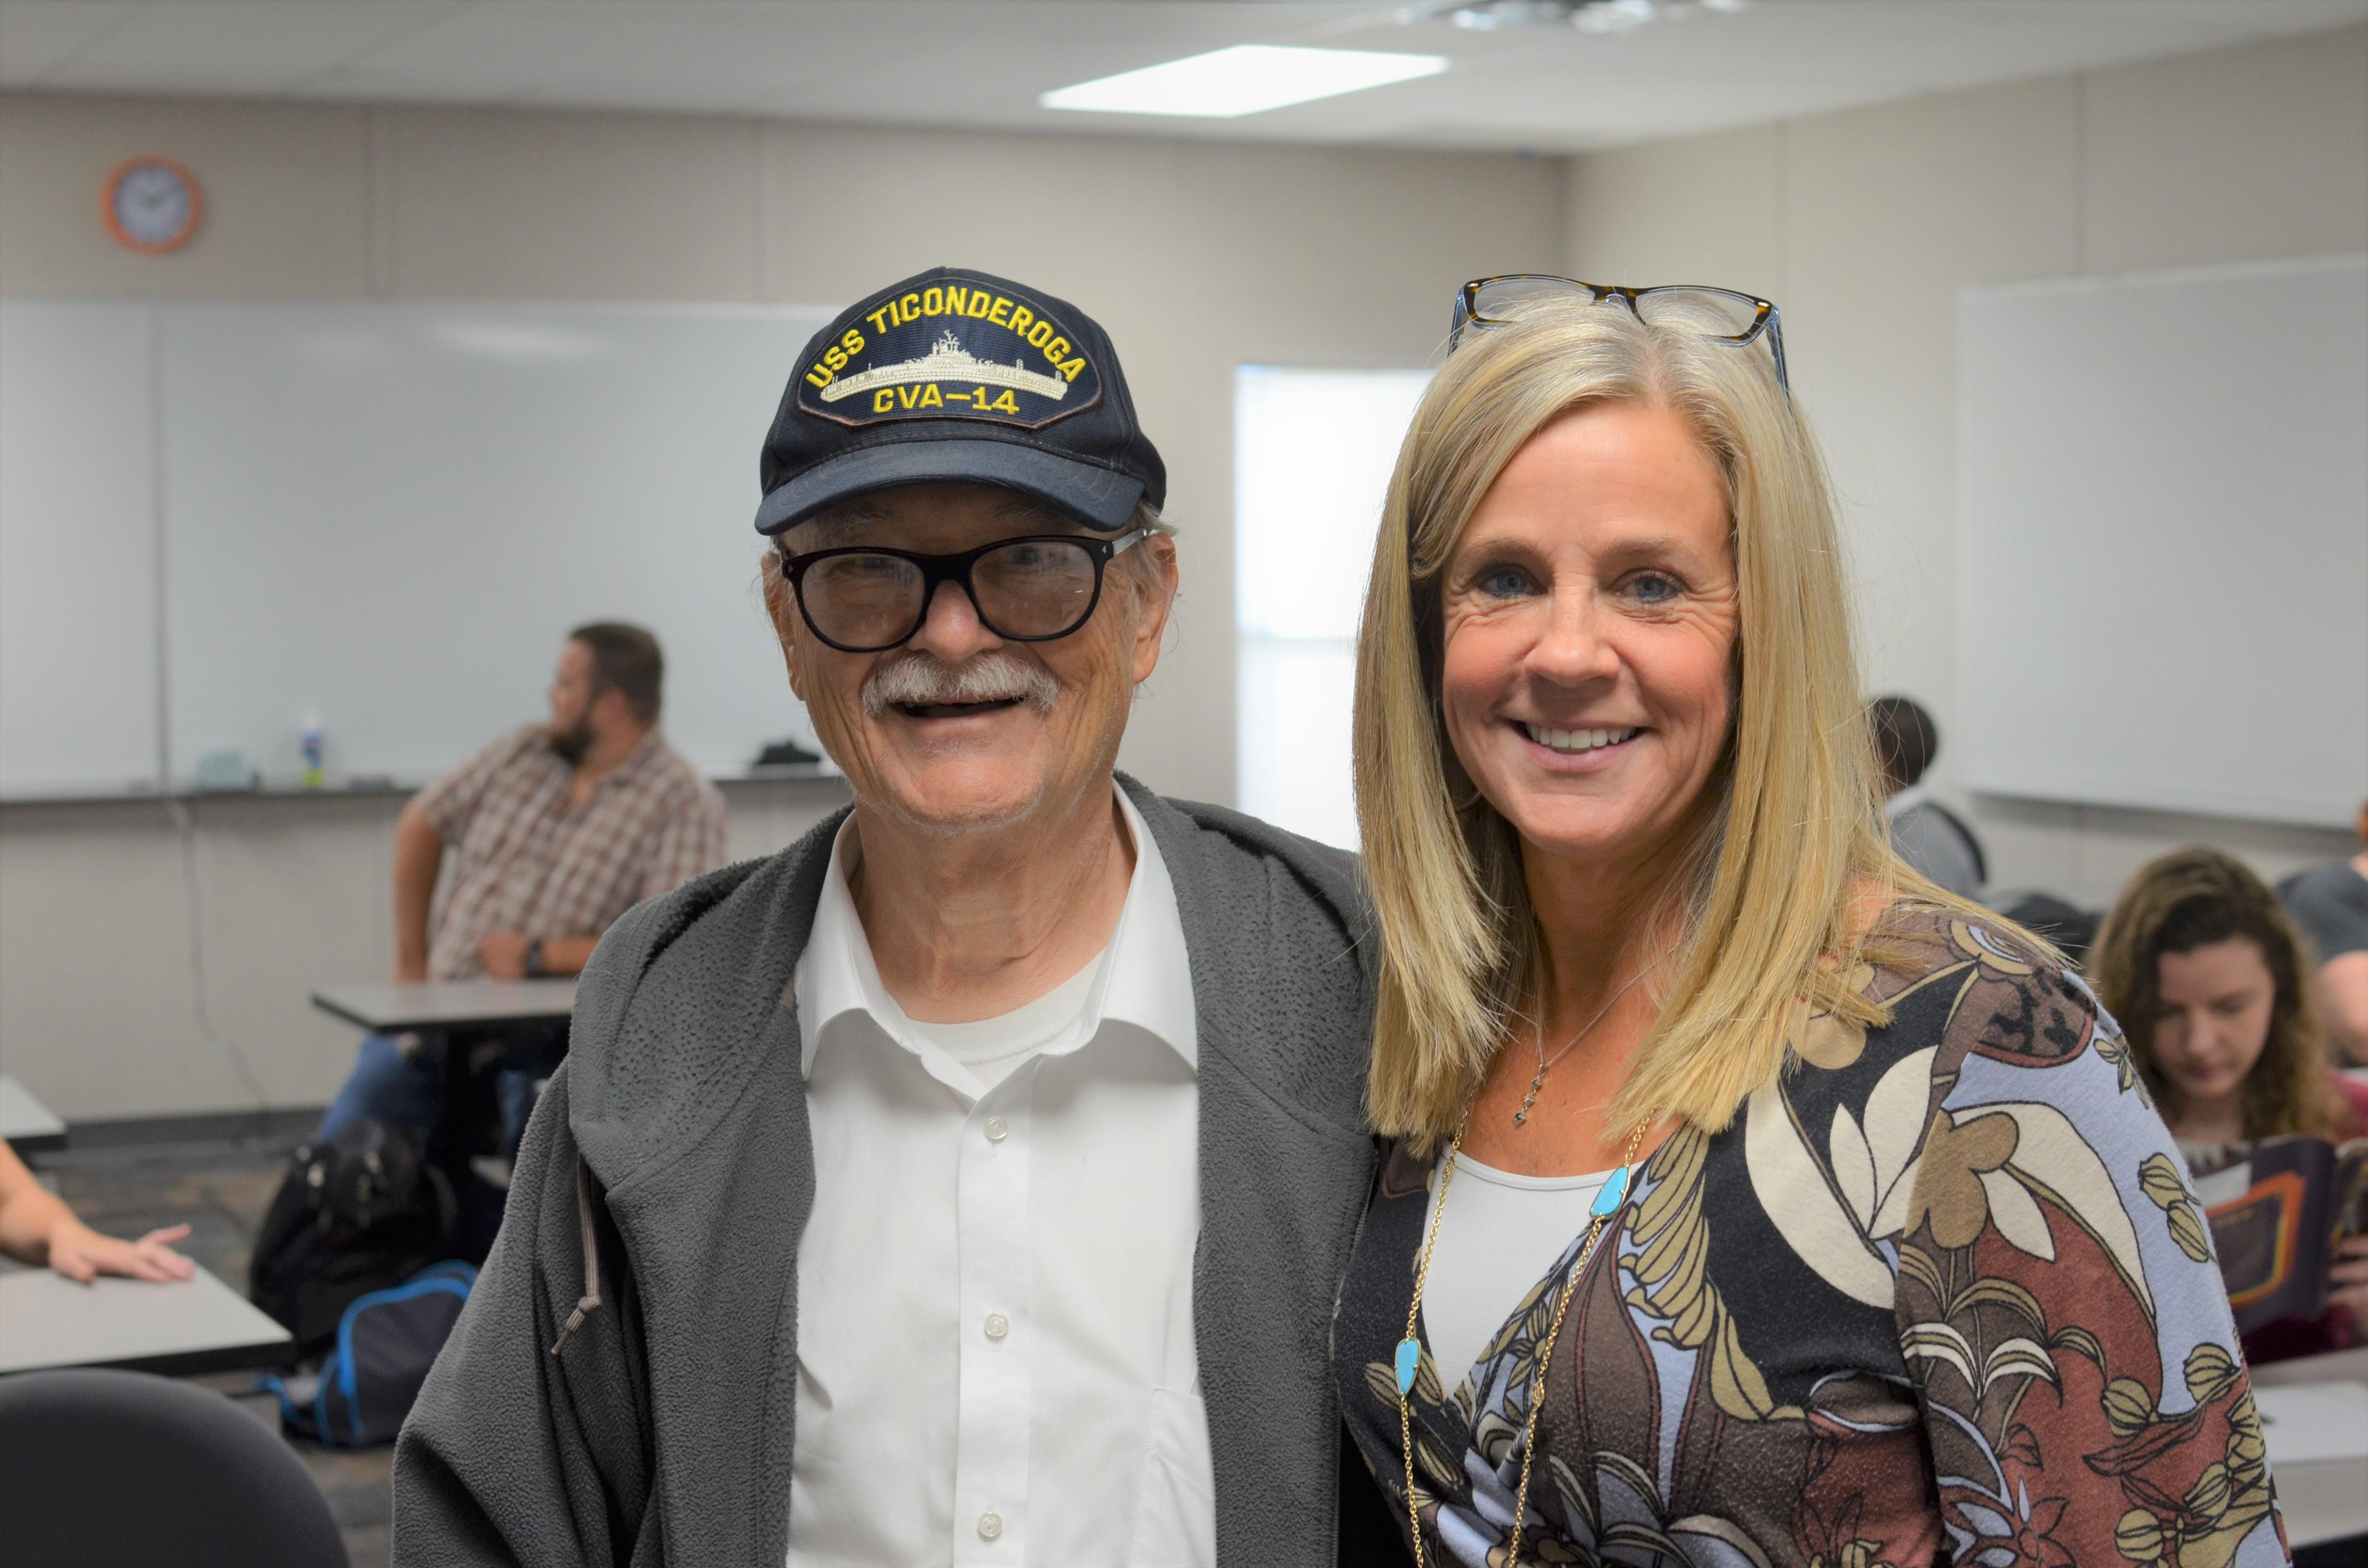 Veteran spreads laughter